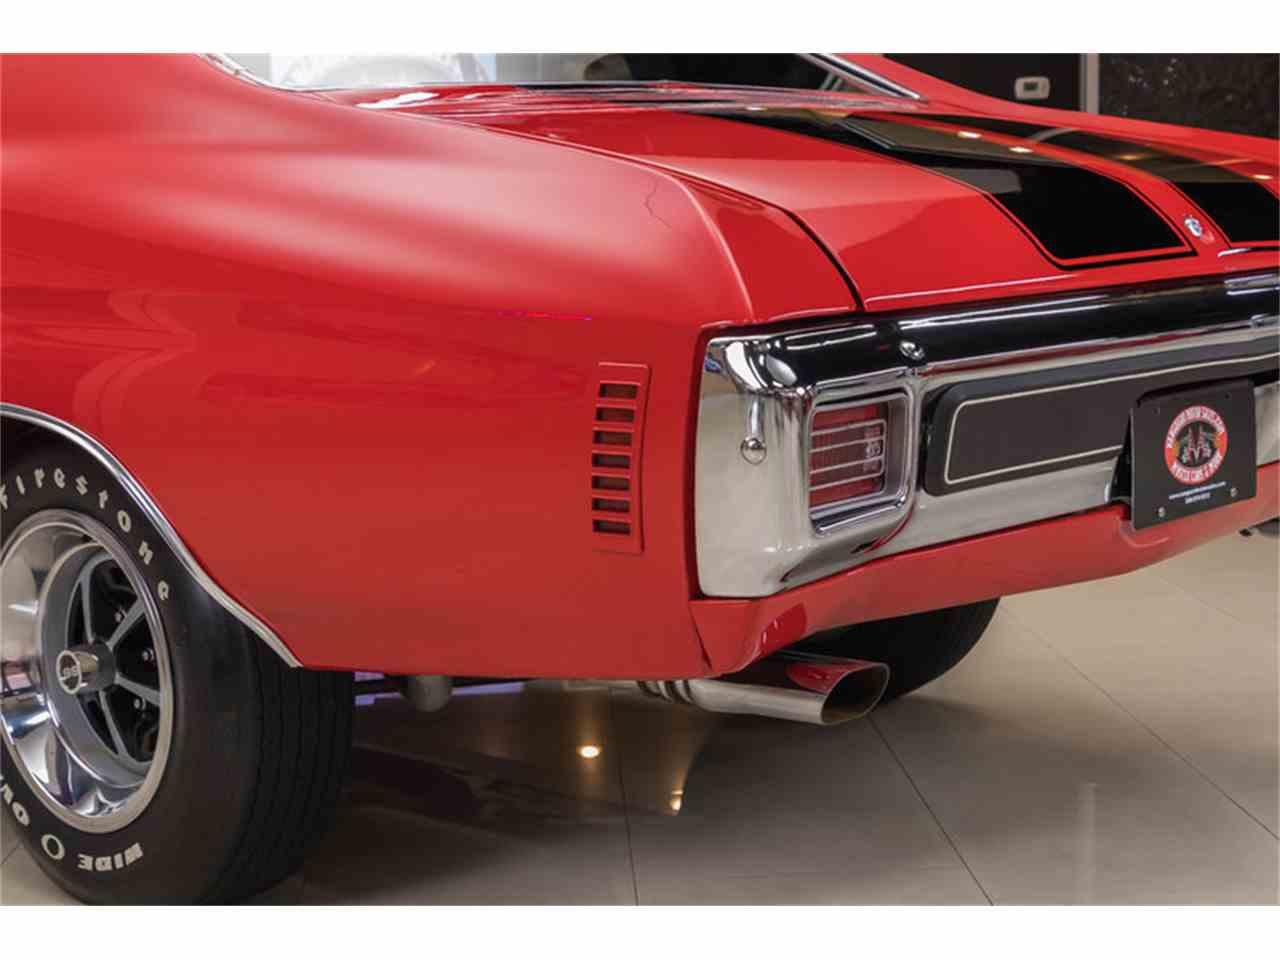 1970 Chevrolet Chevelle for Sale | ClassicCars.com | CC-1015462